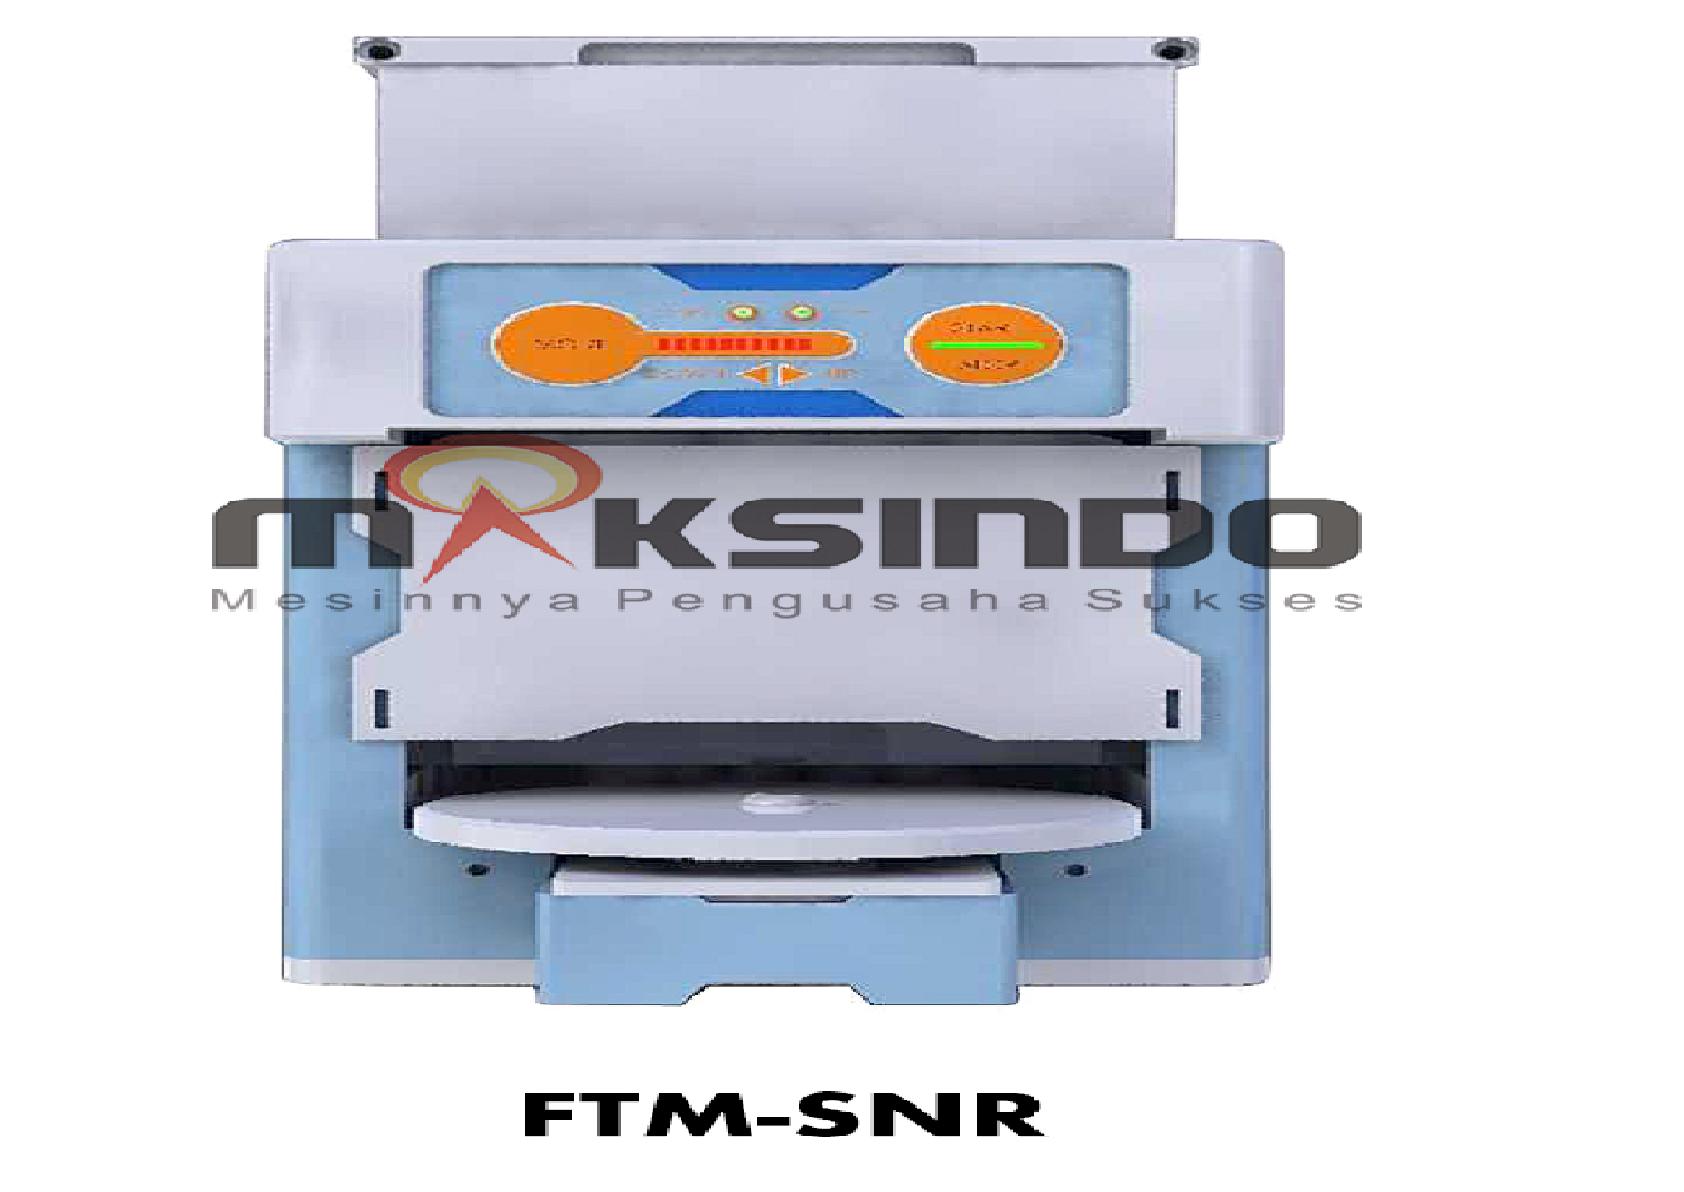 mesin sushi processing equipment 3 maksindobandung